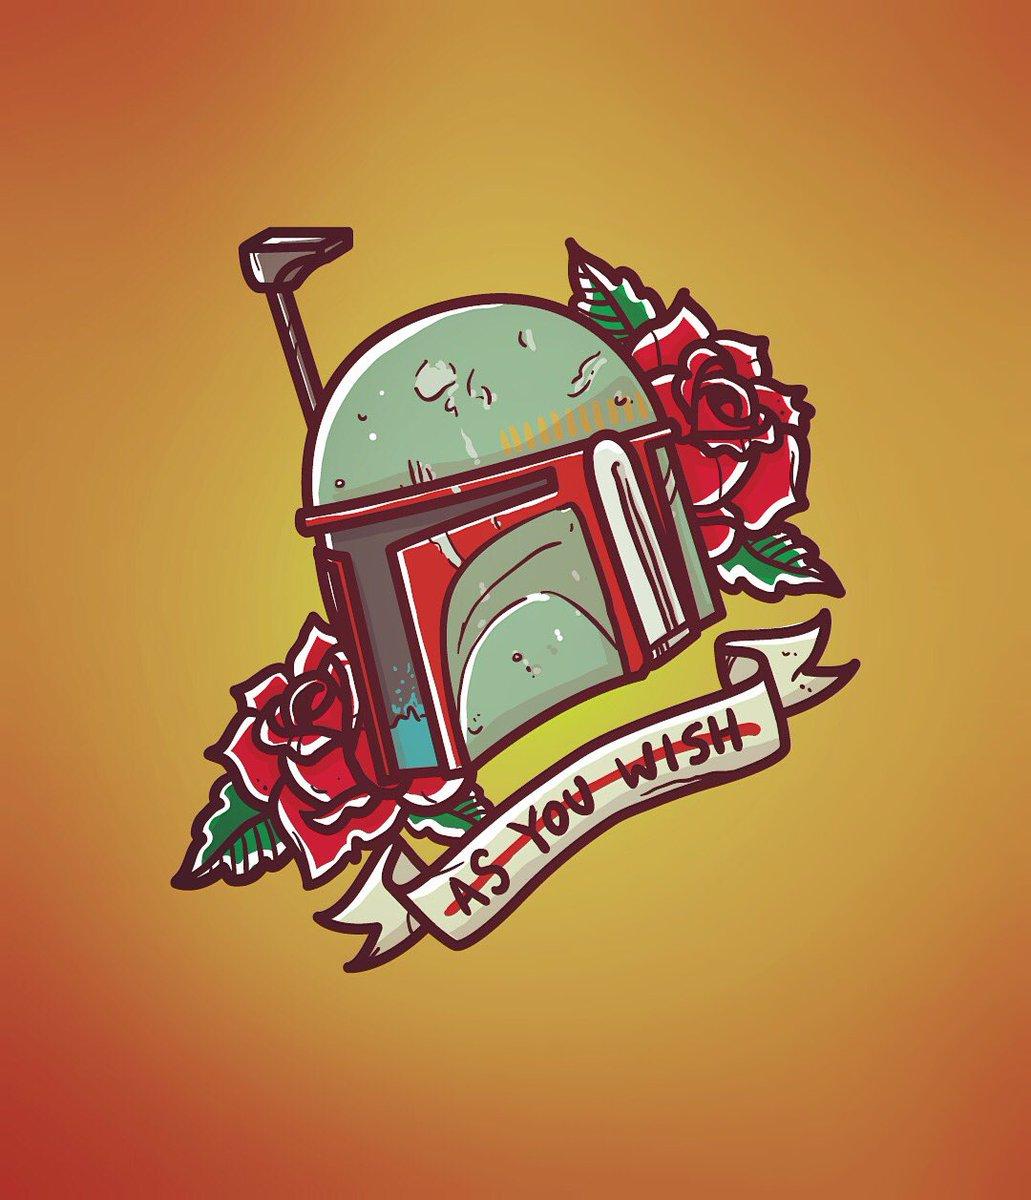 Wanted to do a Boba Fett. Did a Boba Fett. #tattoo #illustration #flash https://t.co/nbC7DbuAdR